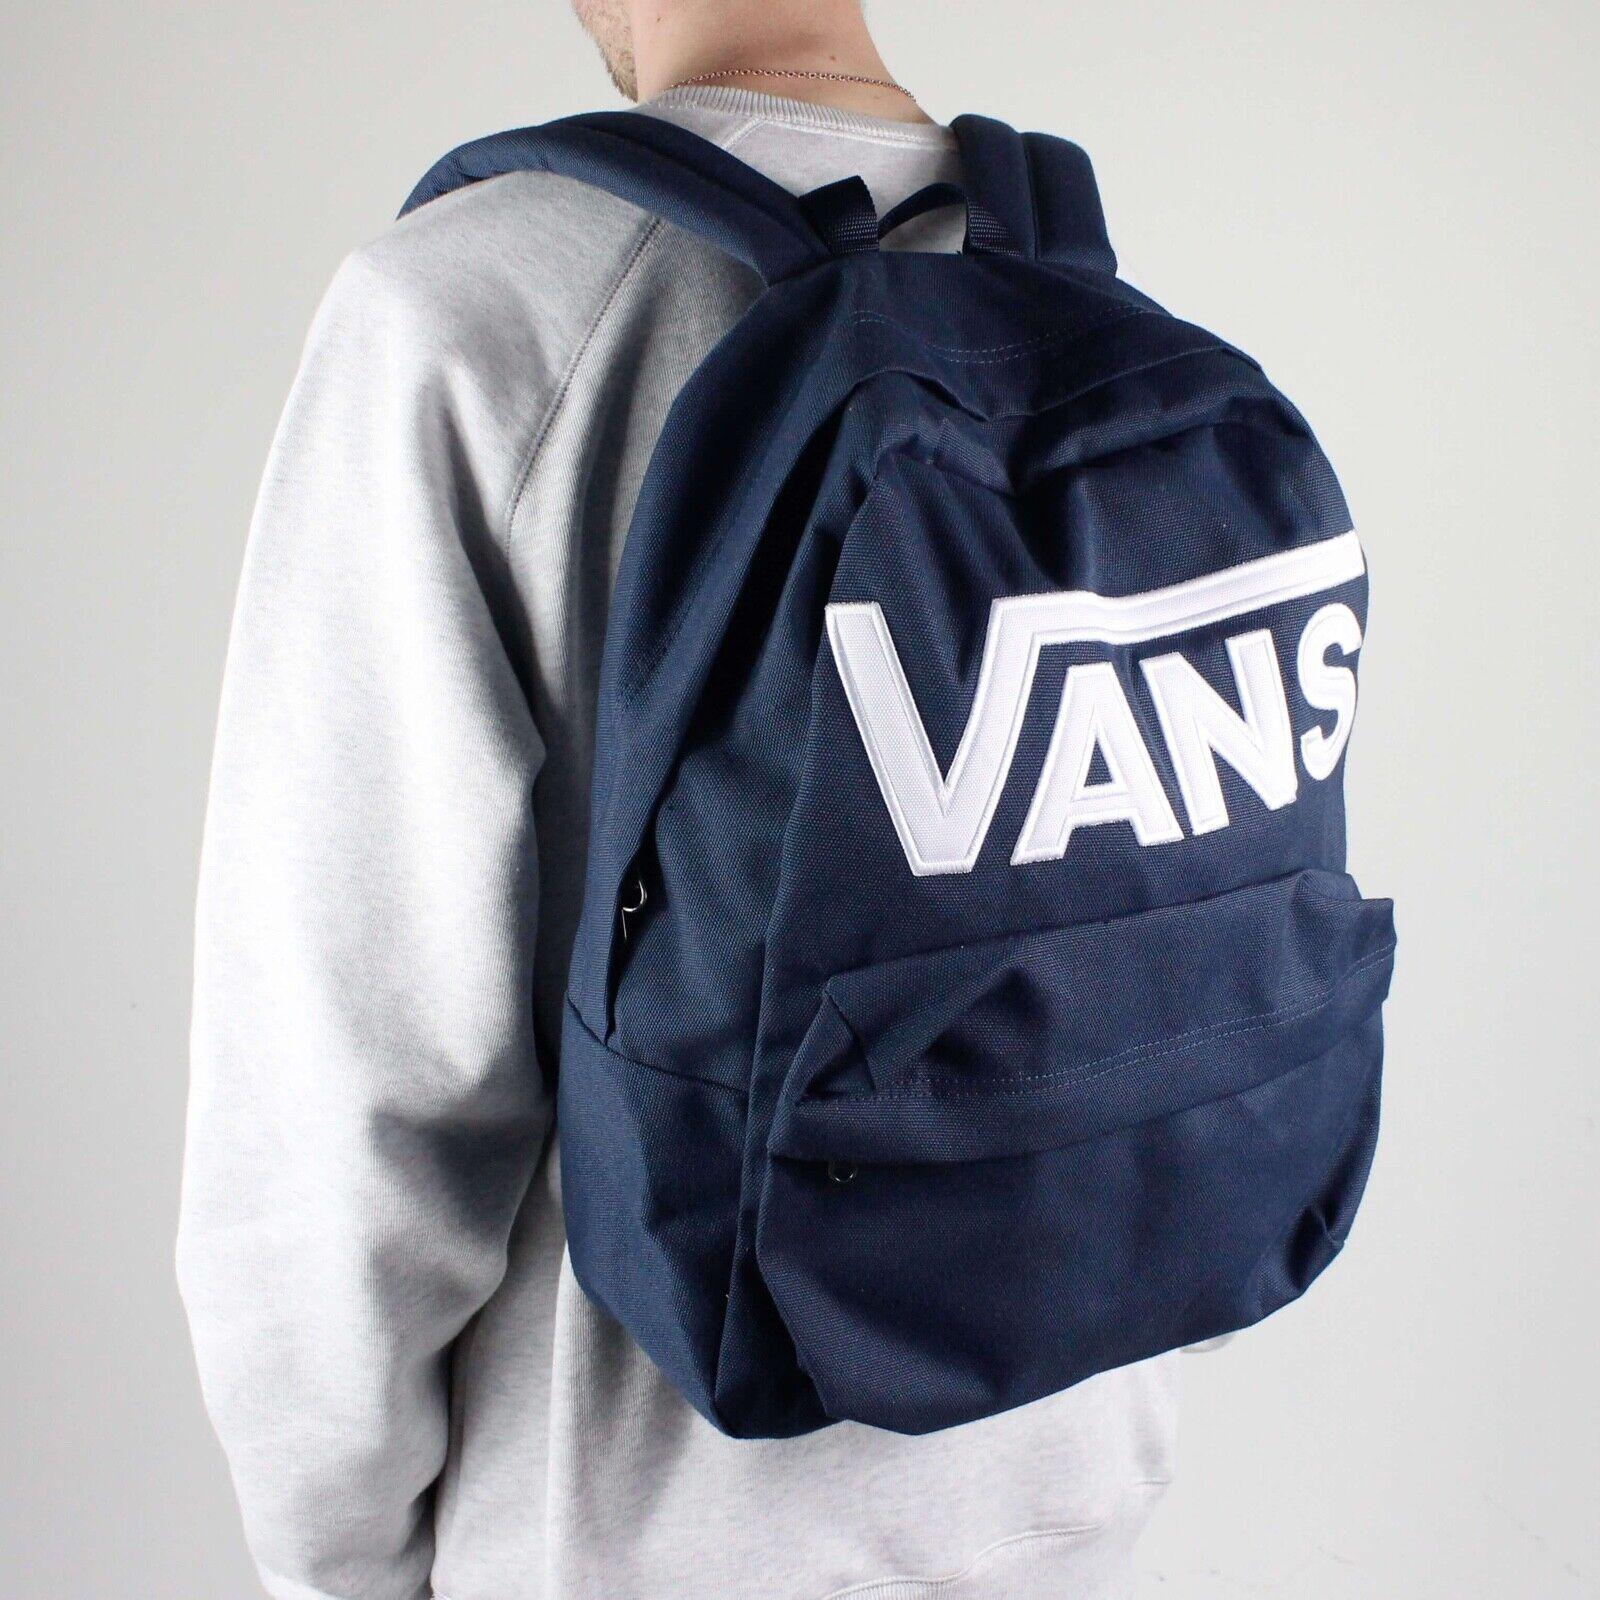 Details about Vans Classic Old Skool BackpackRucksack for SchoolWorkTravel – Navy Blue